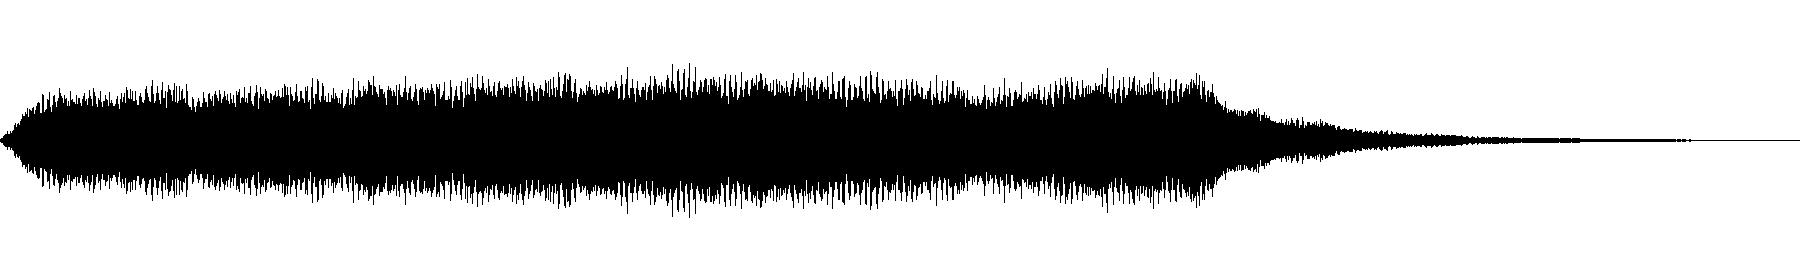 organ a